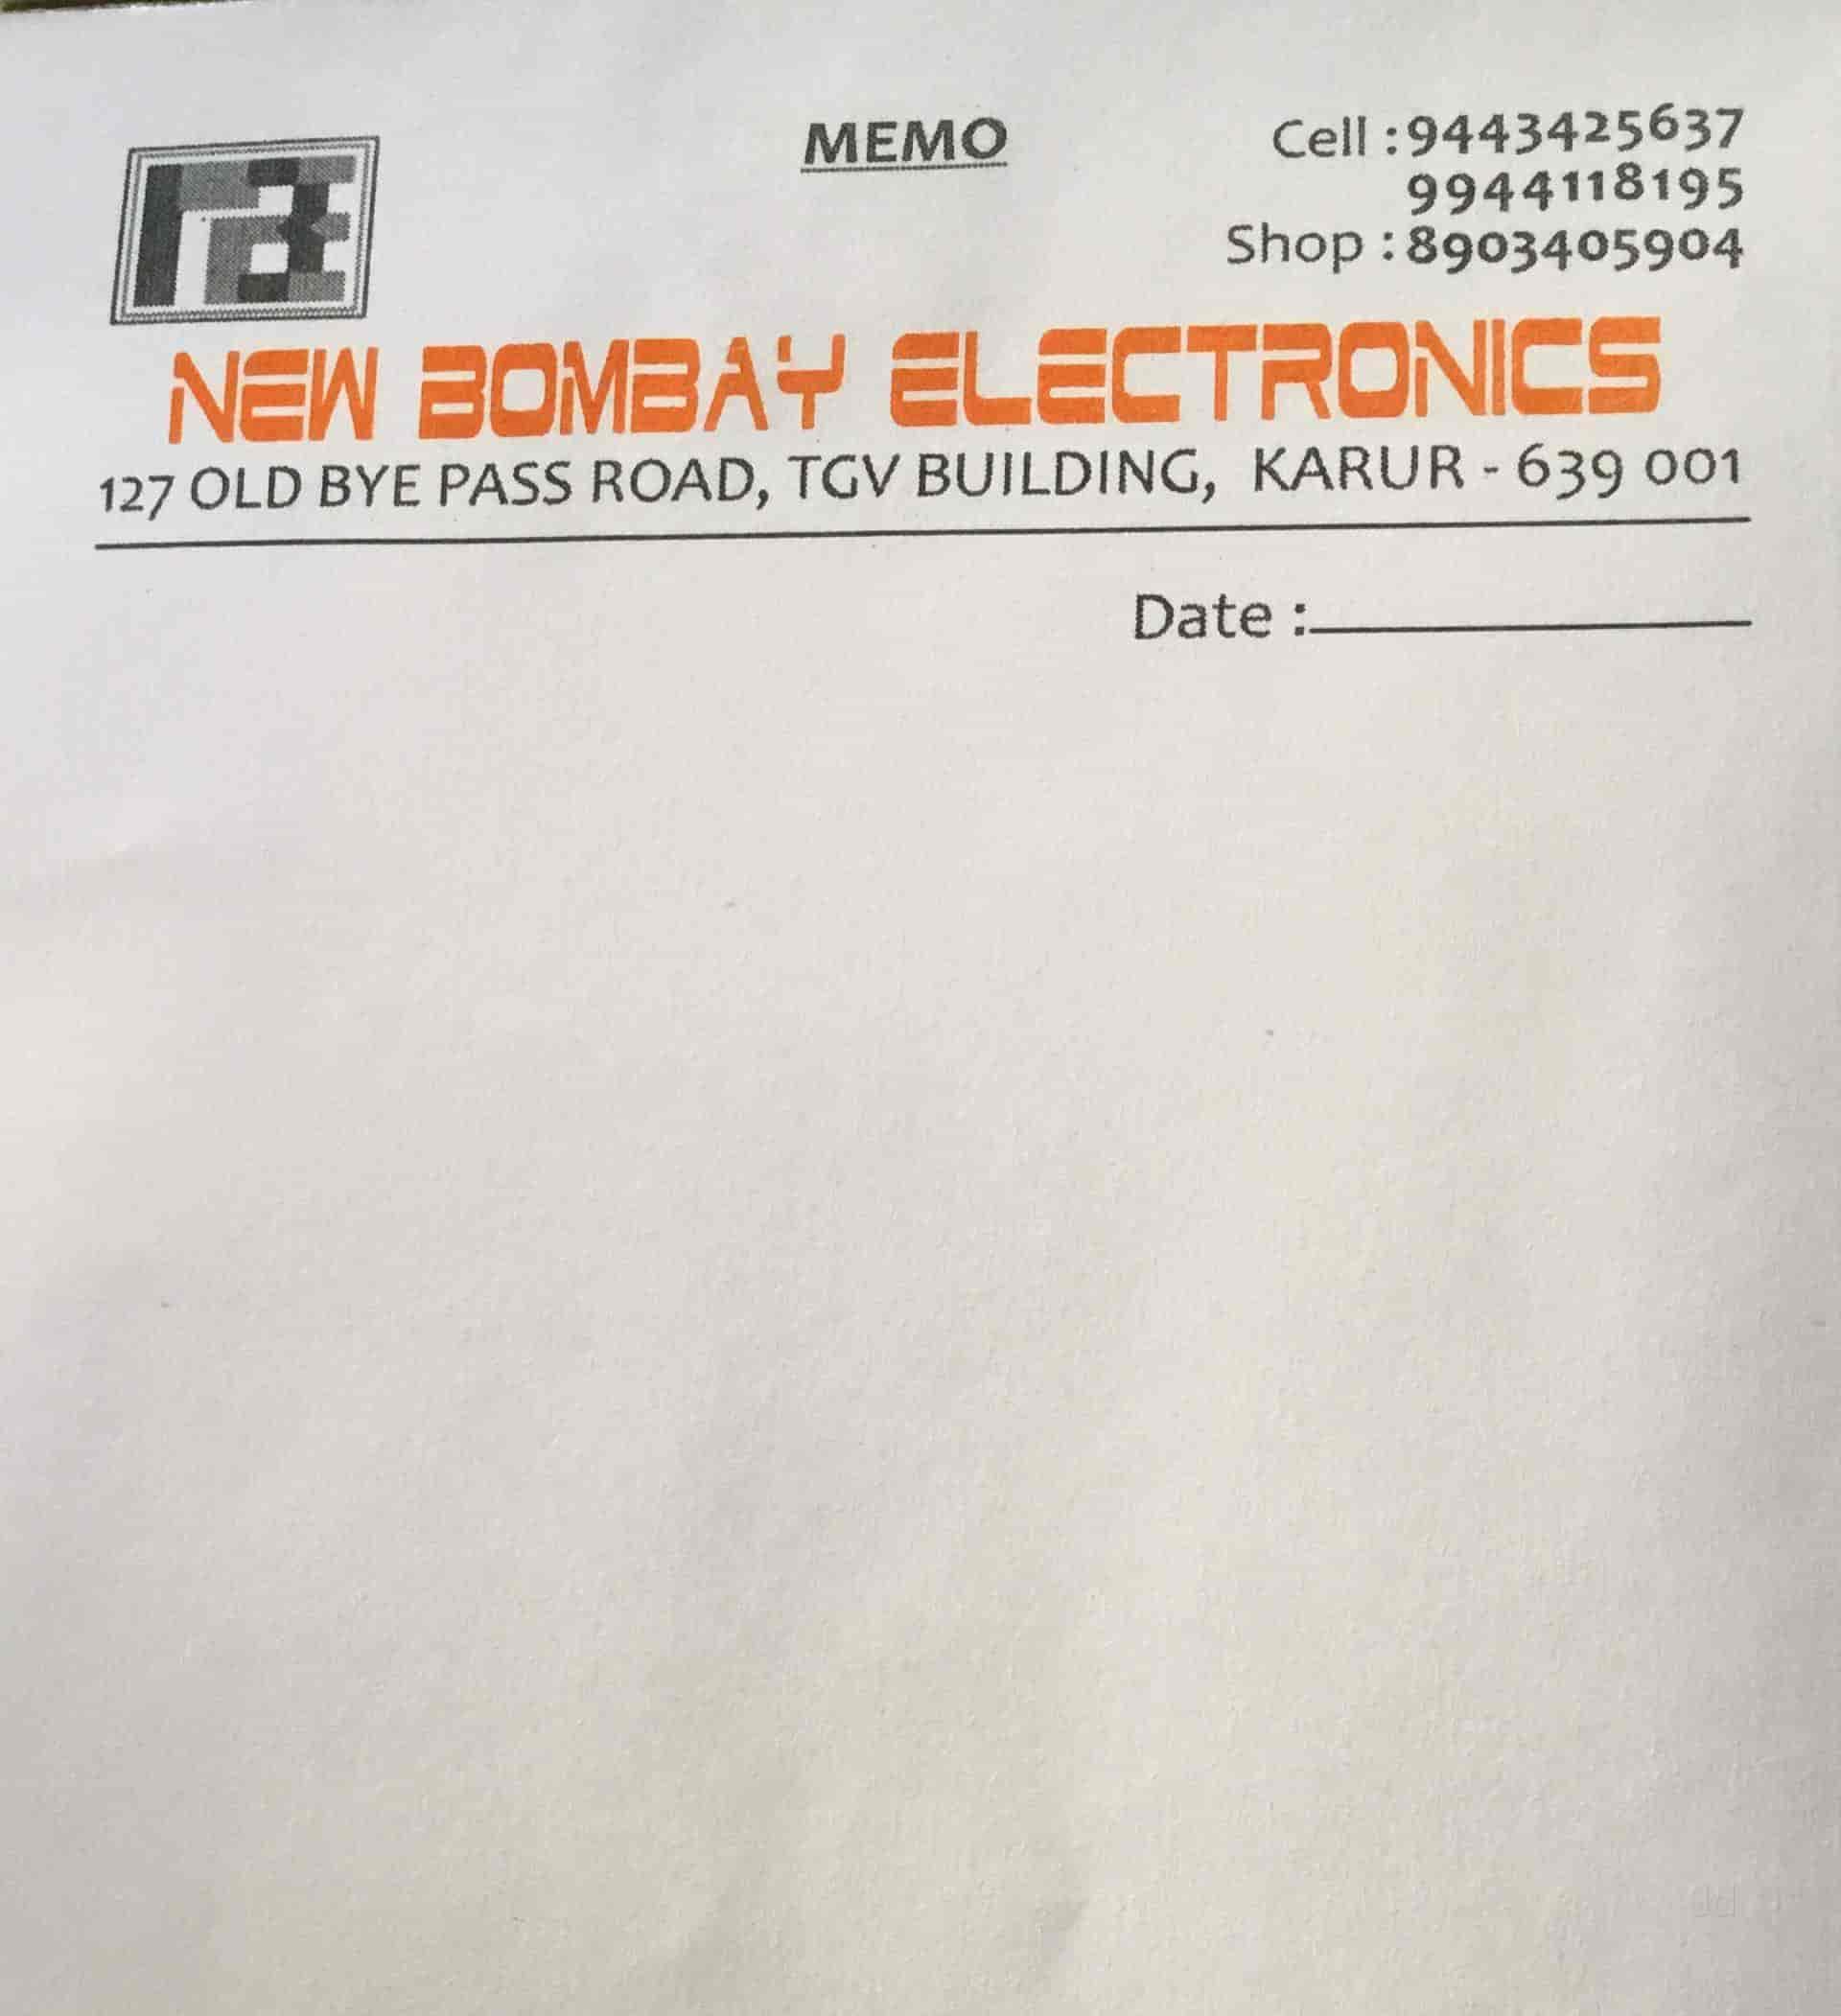 New Bombay Electronics, Karur HO - Car Audio System Dealers